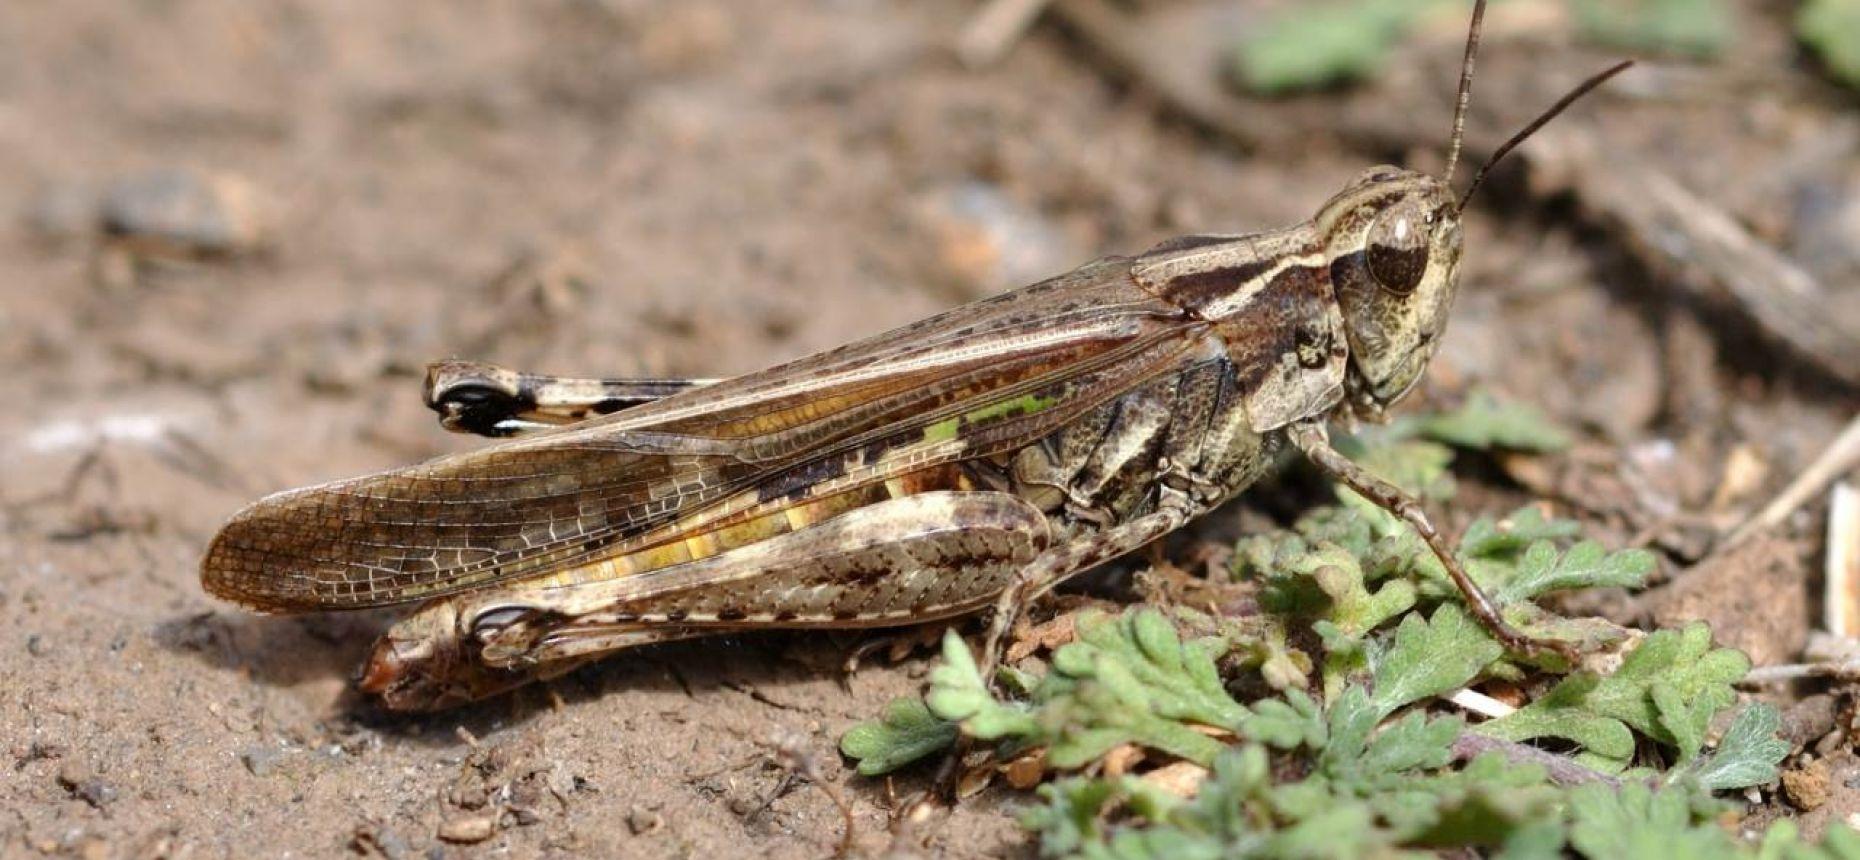 Мароккская саранча - Dociostaurus maroccanus (Thnb.)